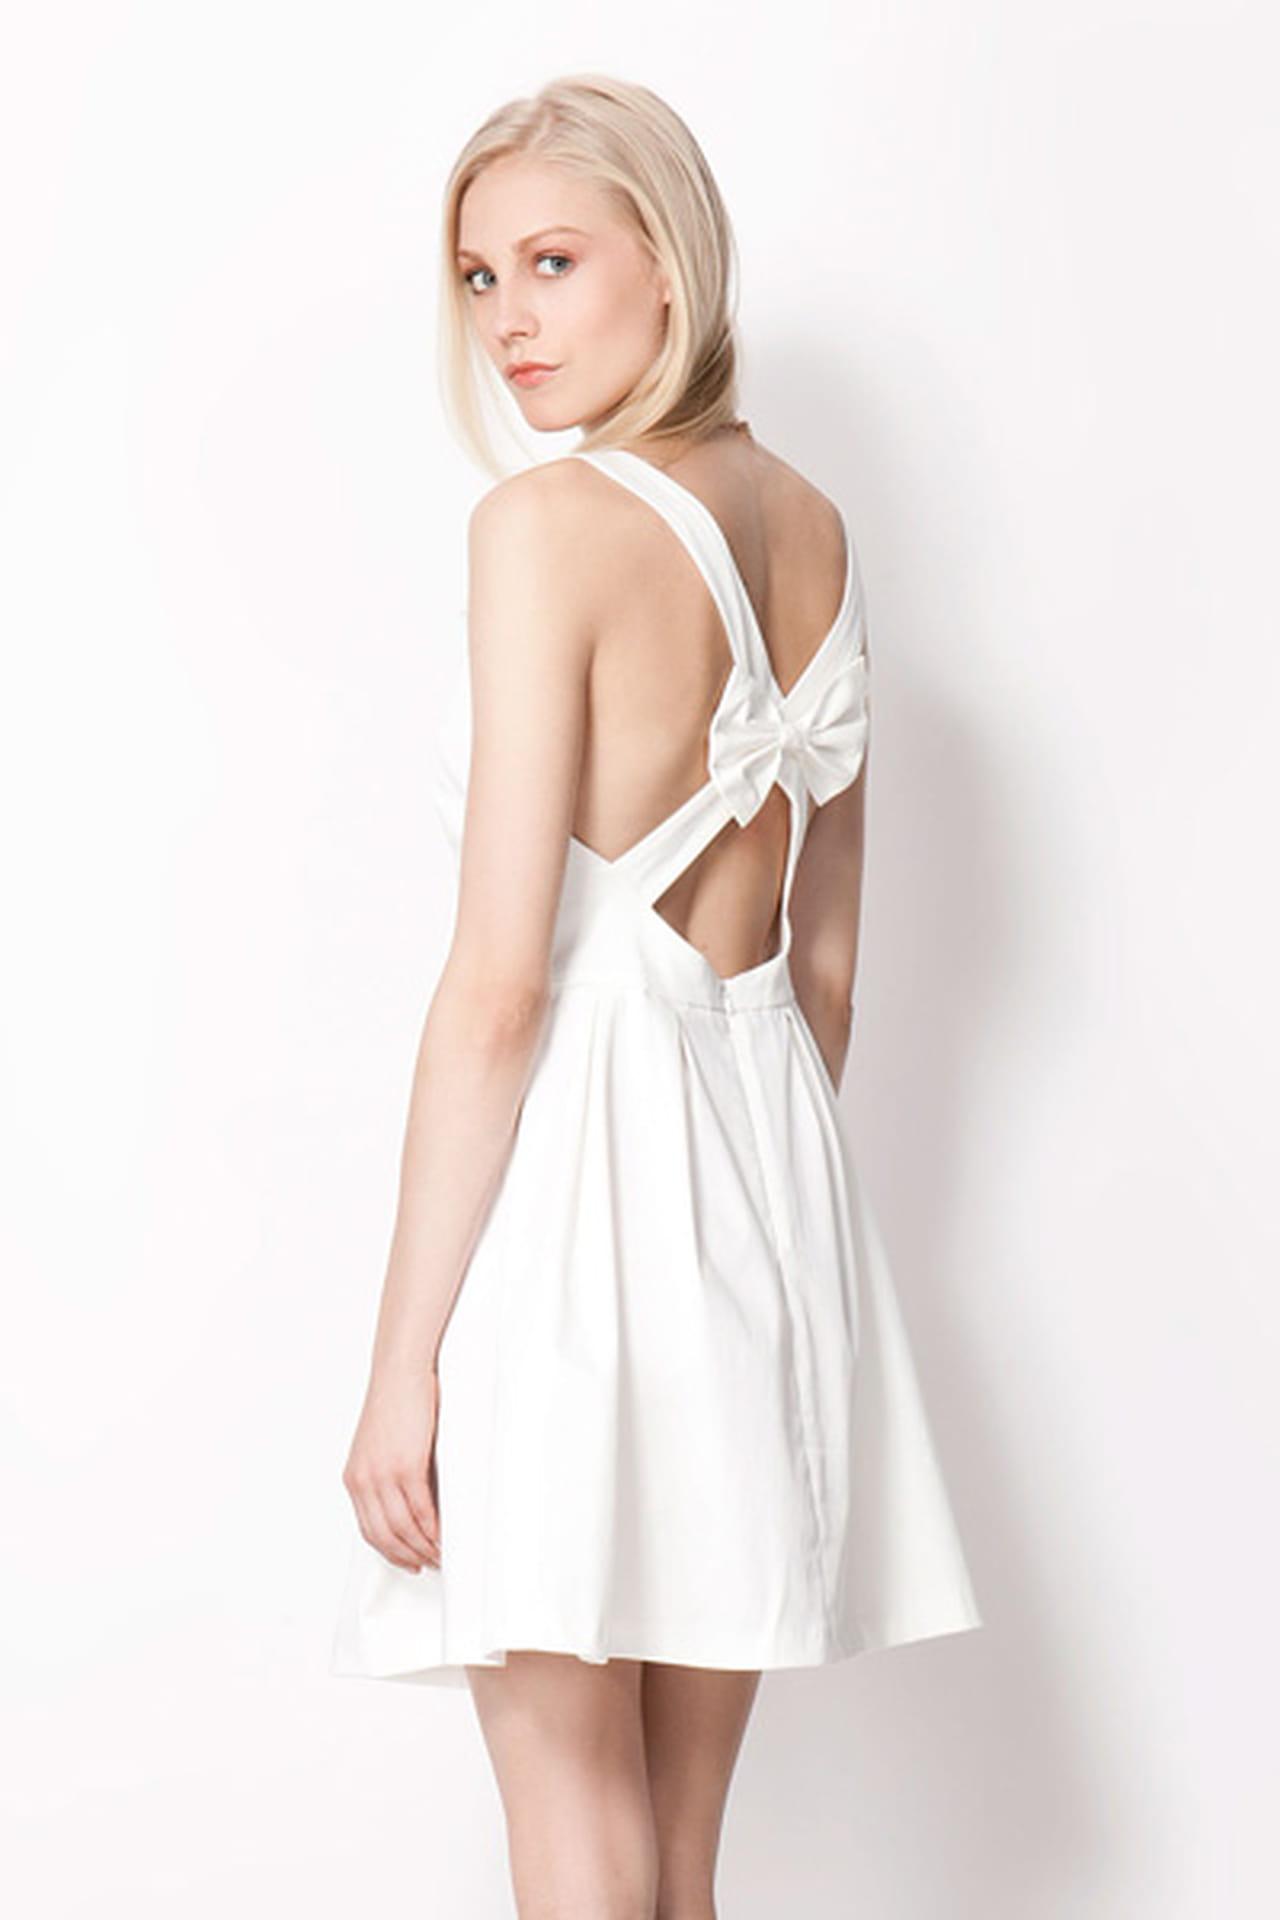 5ddc8a7b86eee فستان مع فيونكة جميلة من Bershka. فستان أبيض من Bershka. من موضة صيف 2013